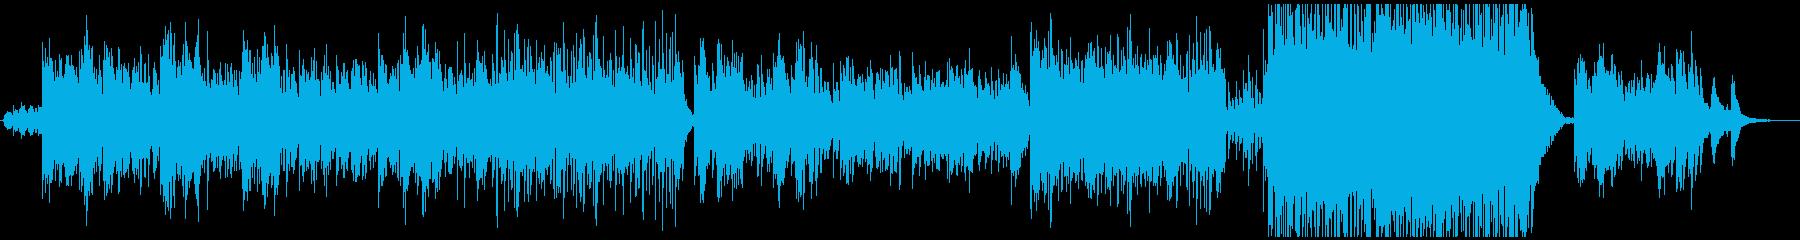 Greenishの再生済みの波形